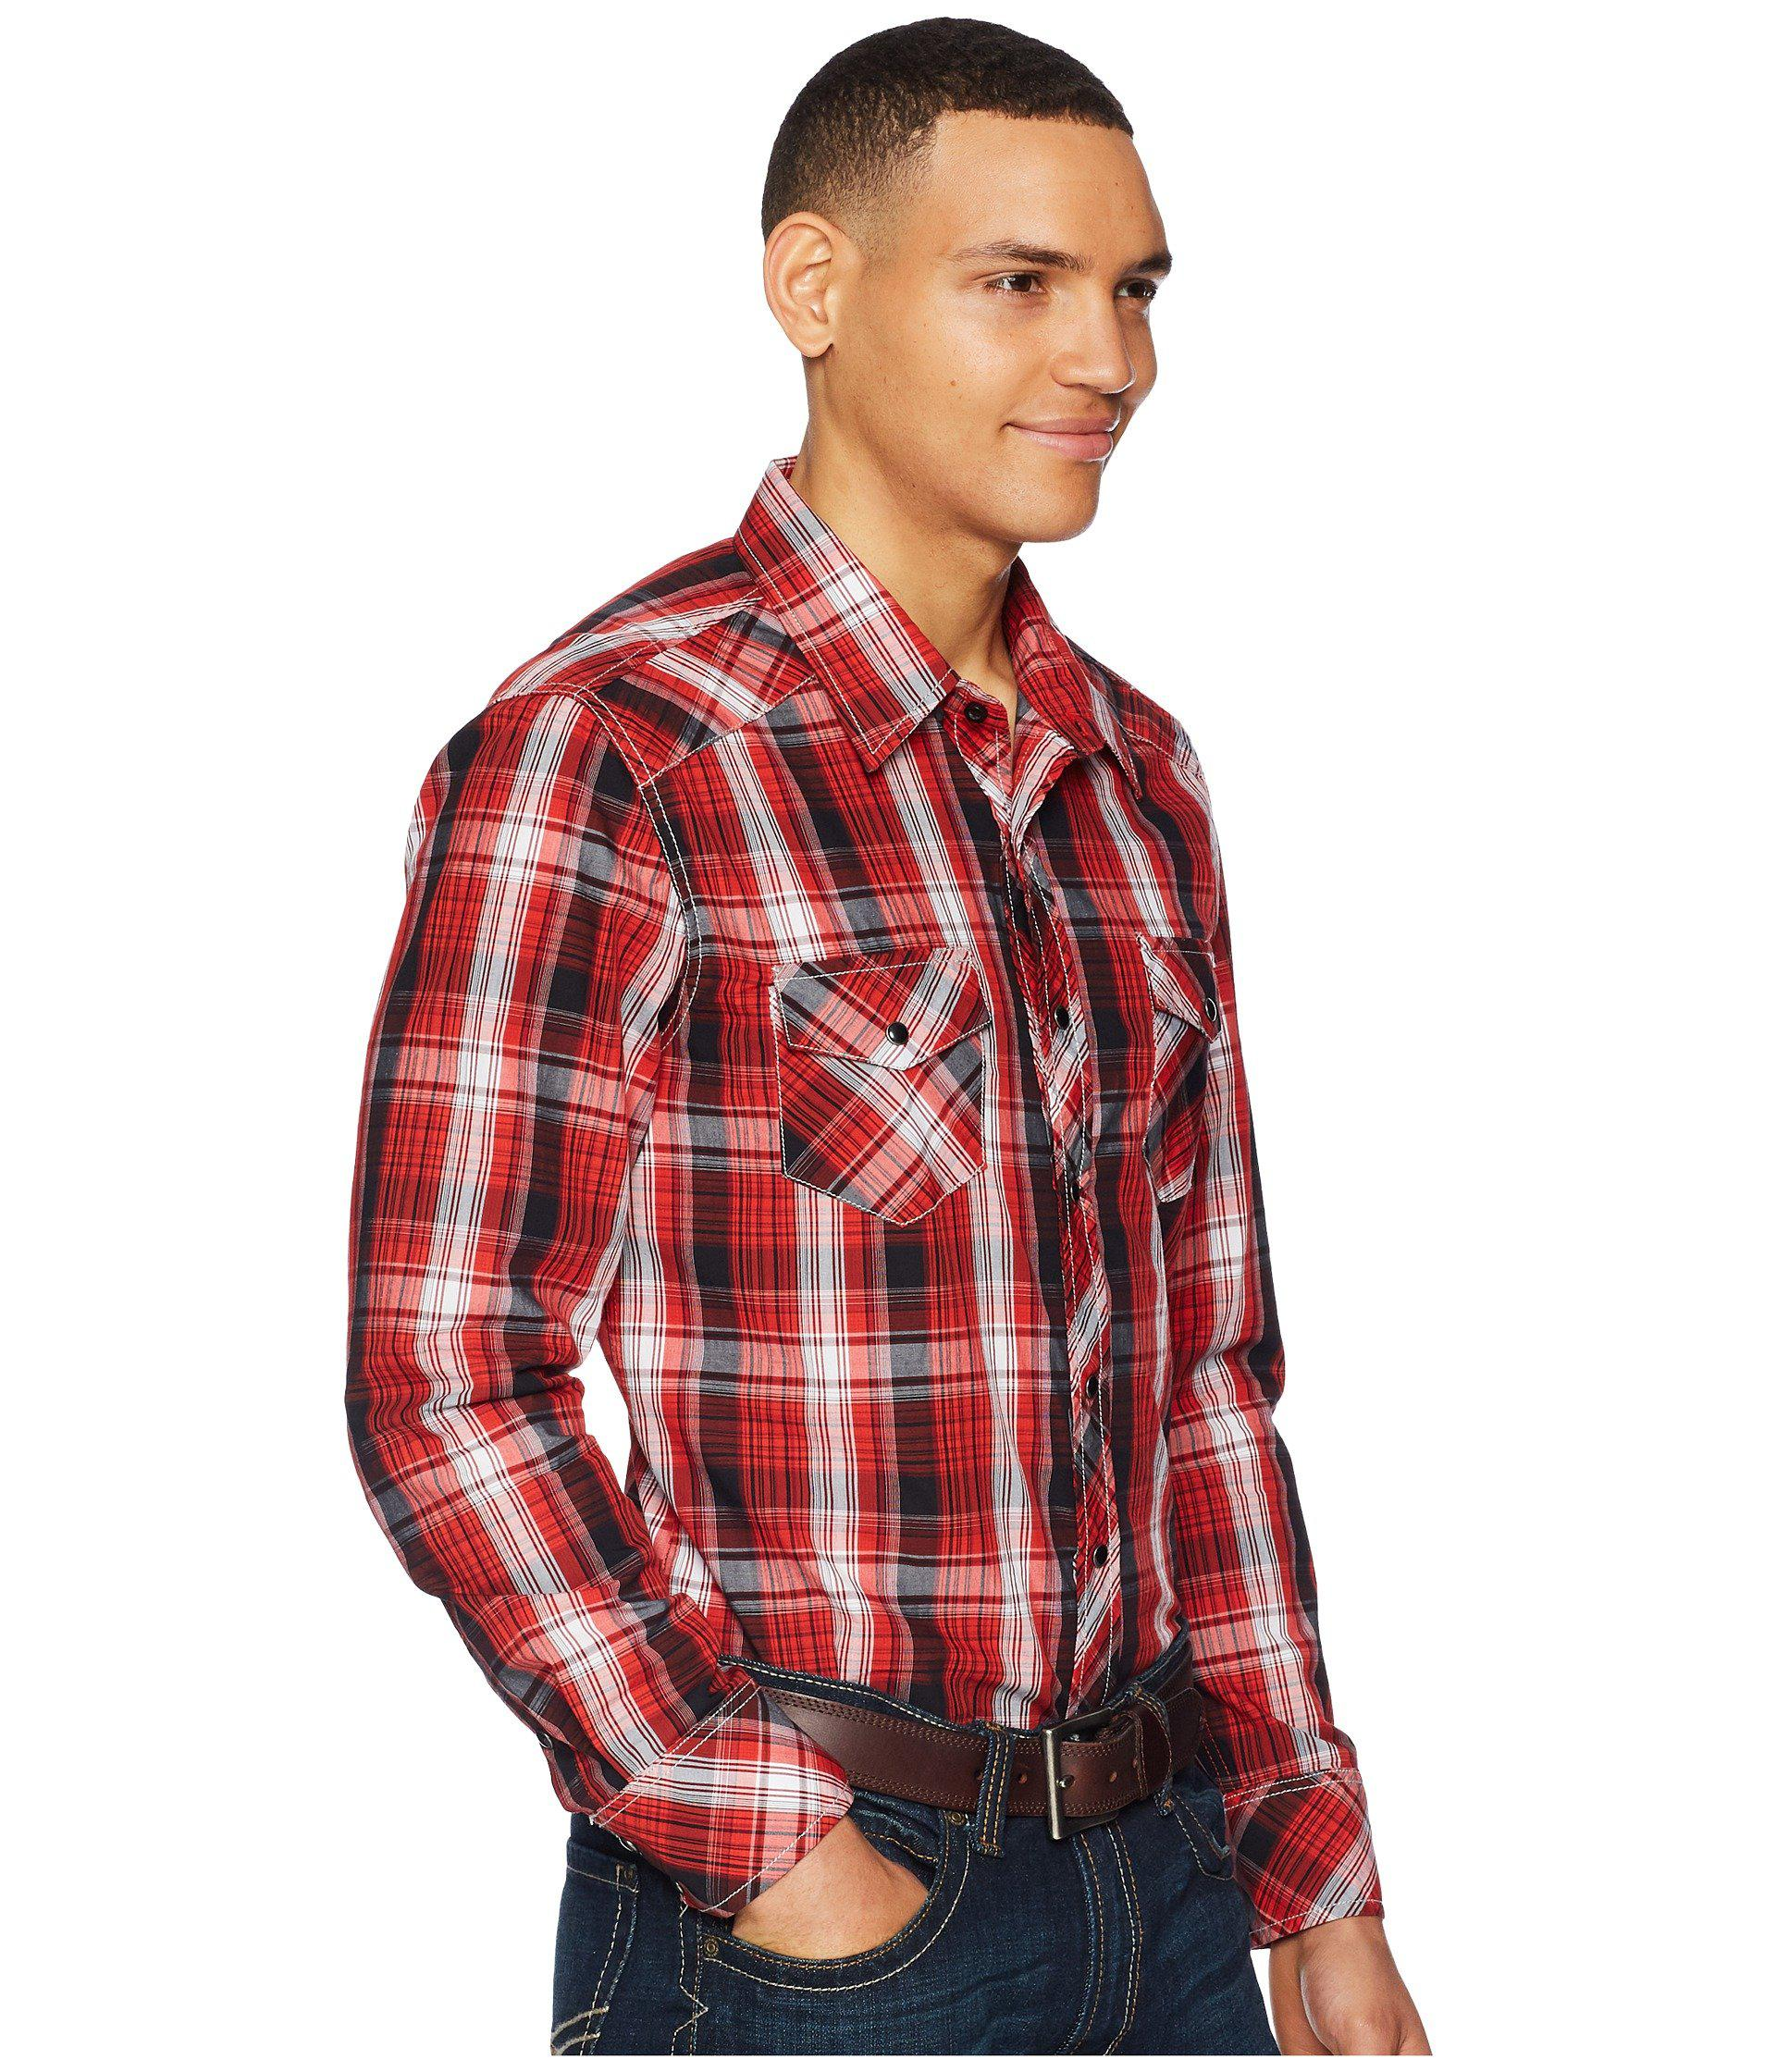 Rock /& Roll Cowboy Men/'s Red /& Black Plaid Snap Up Western Shirt B2S5718